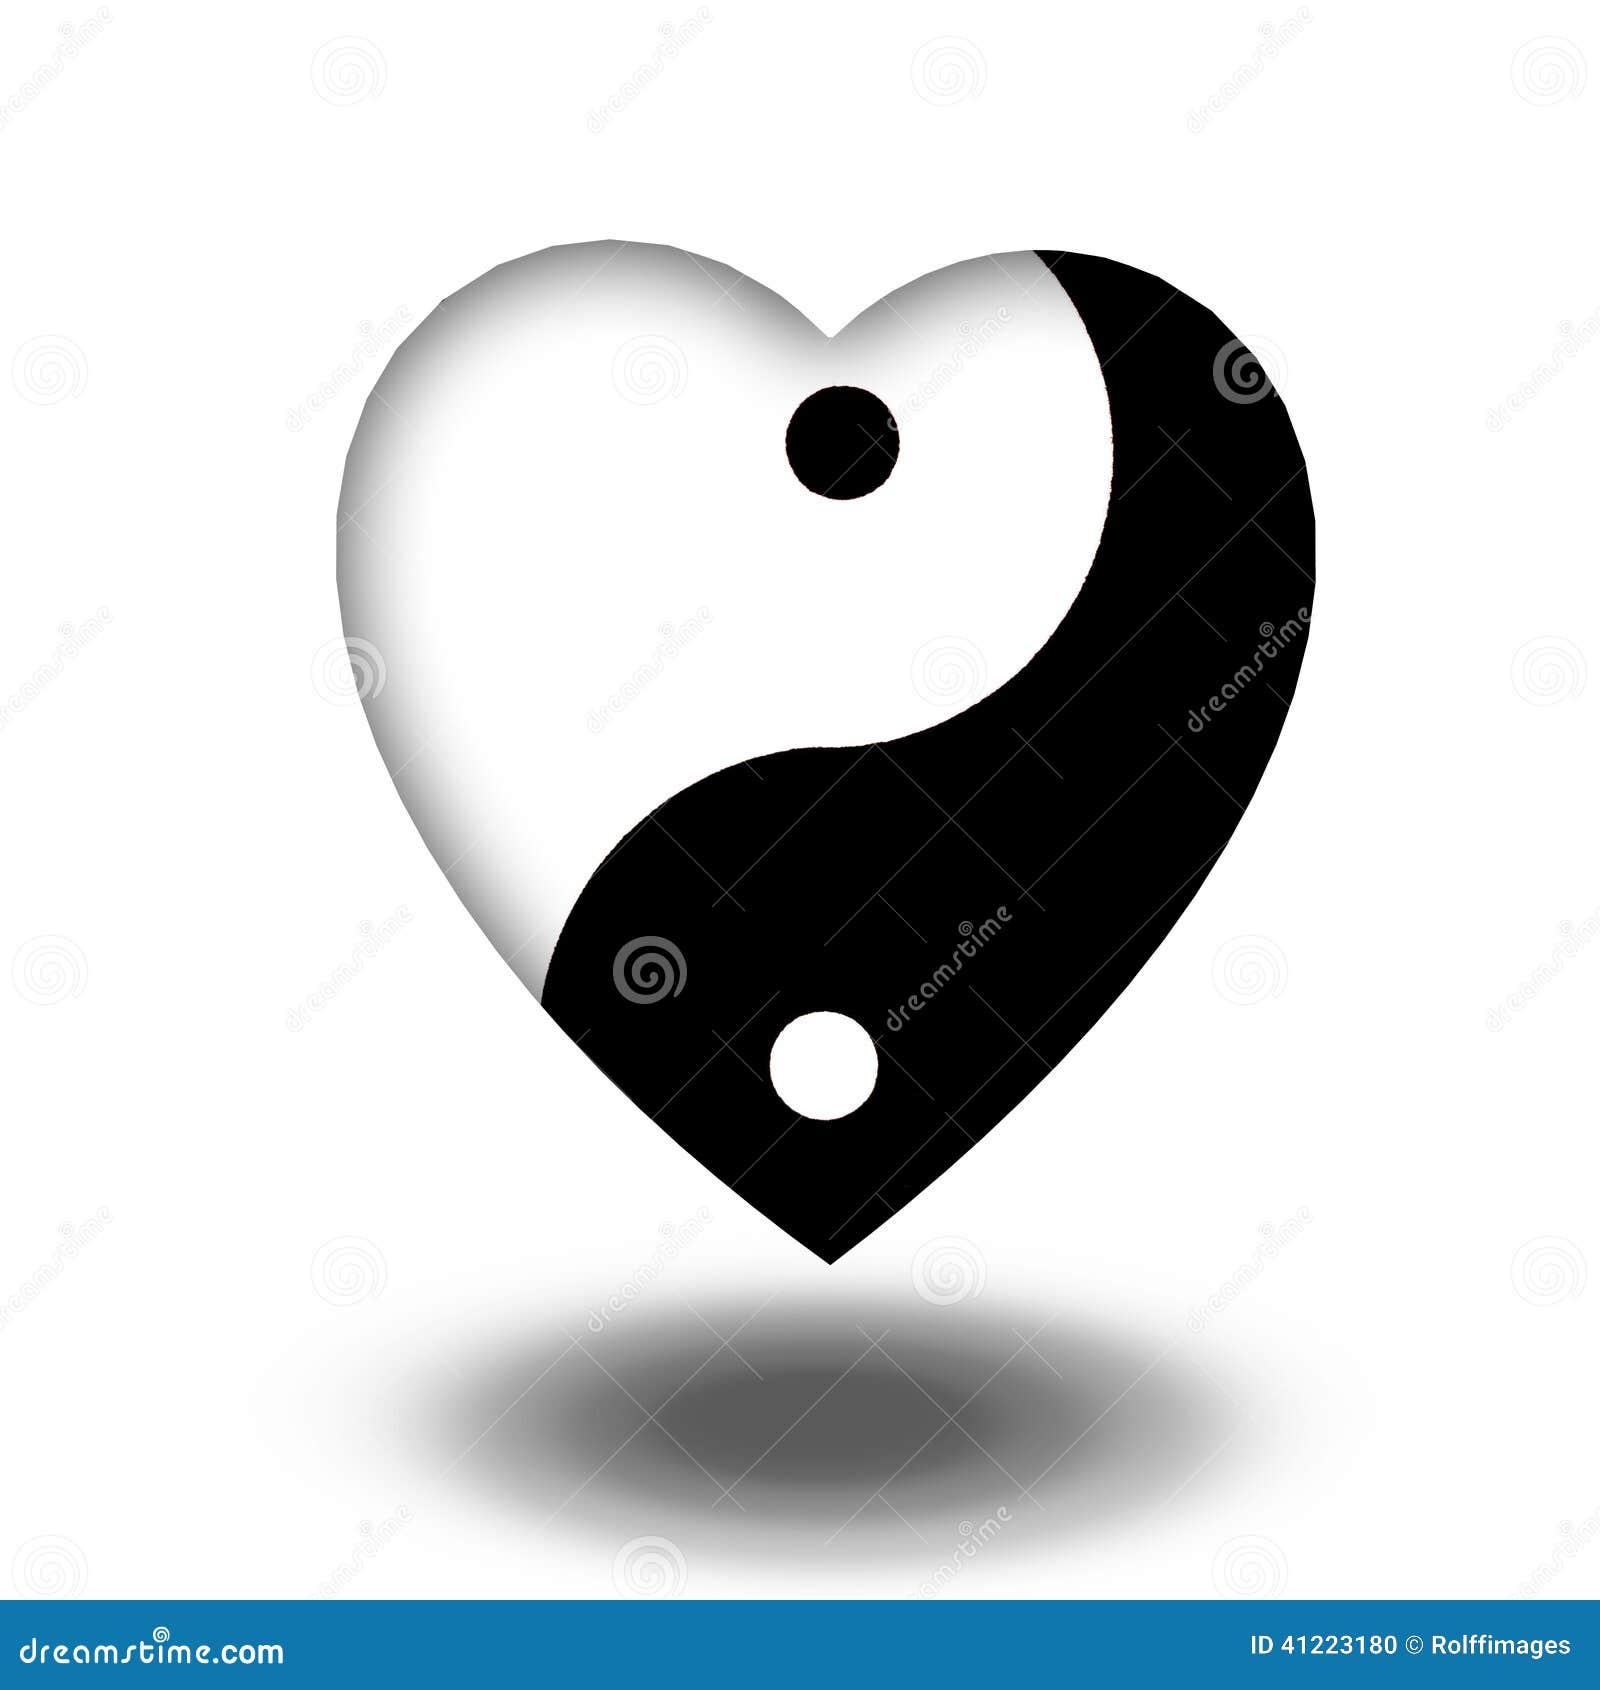 Yin yang heart stock illustratie afbeelding 41223180 for Yin yang raumgestaltung